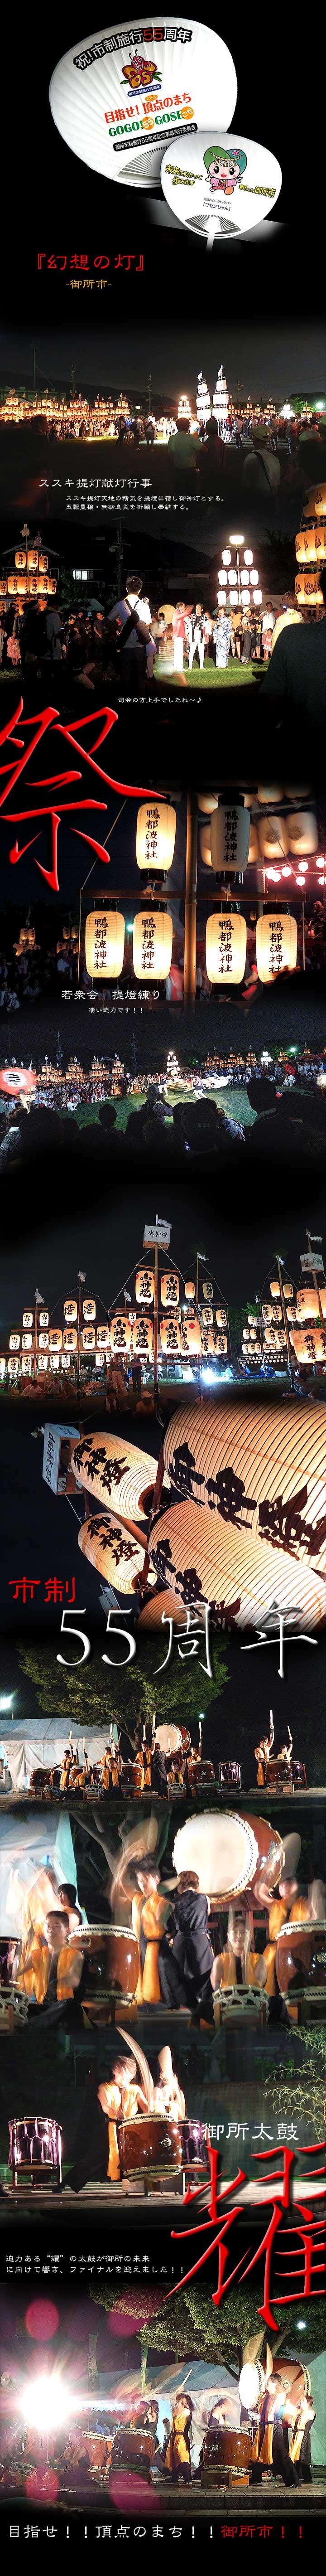 gogo御所祭り